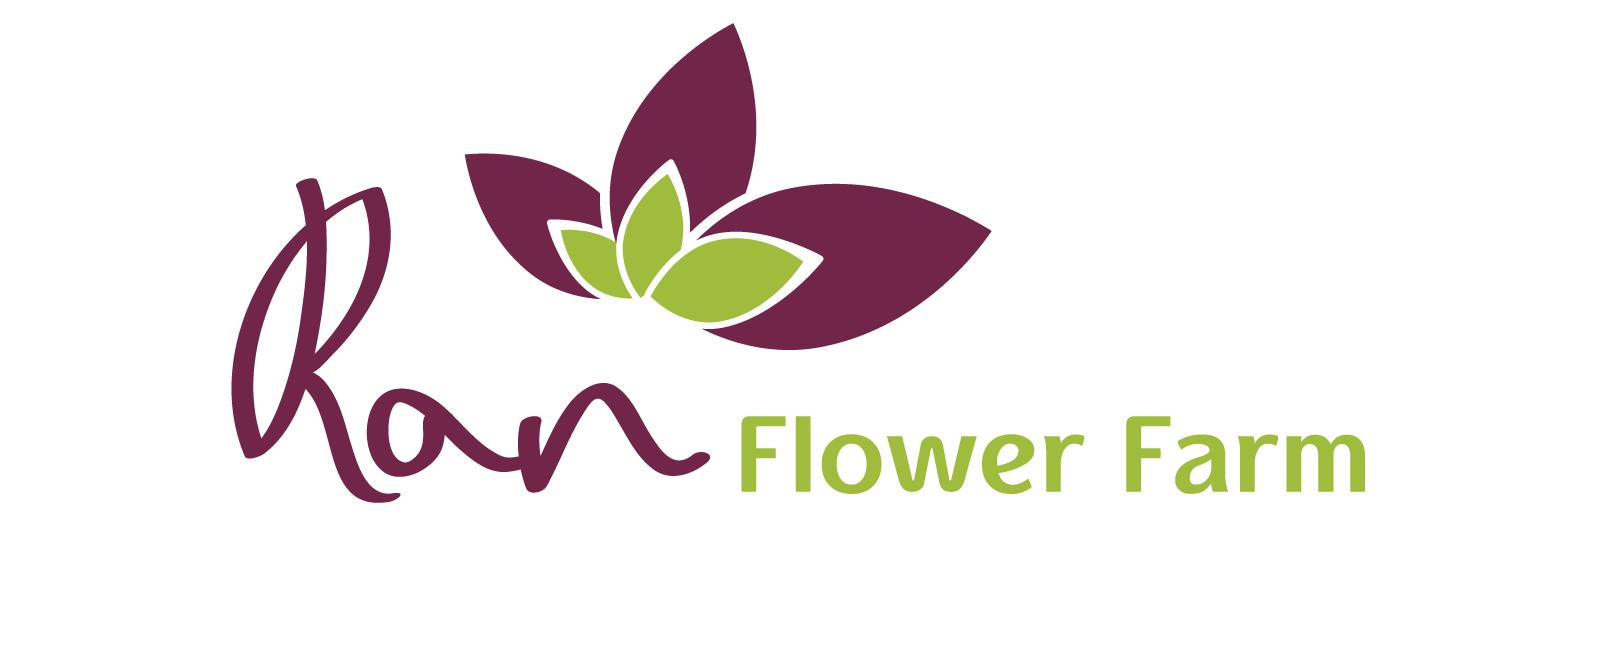 http://bigeyes.co.il/wp-content/uploads/2019/06/Ran-Flower-Farm-1-1.png